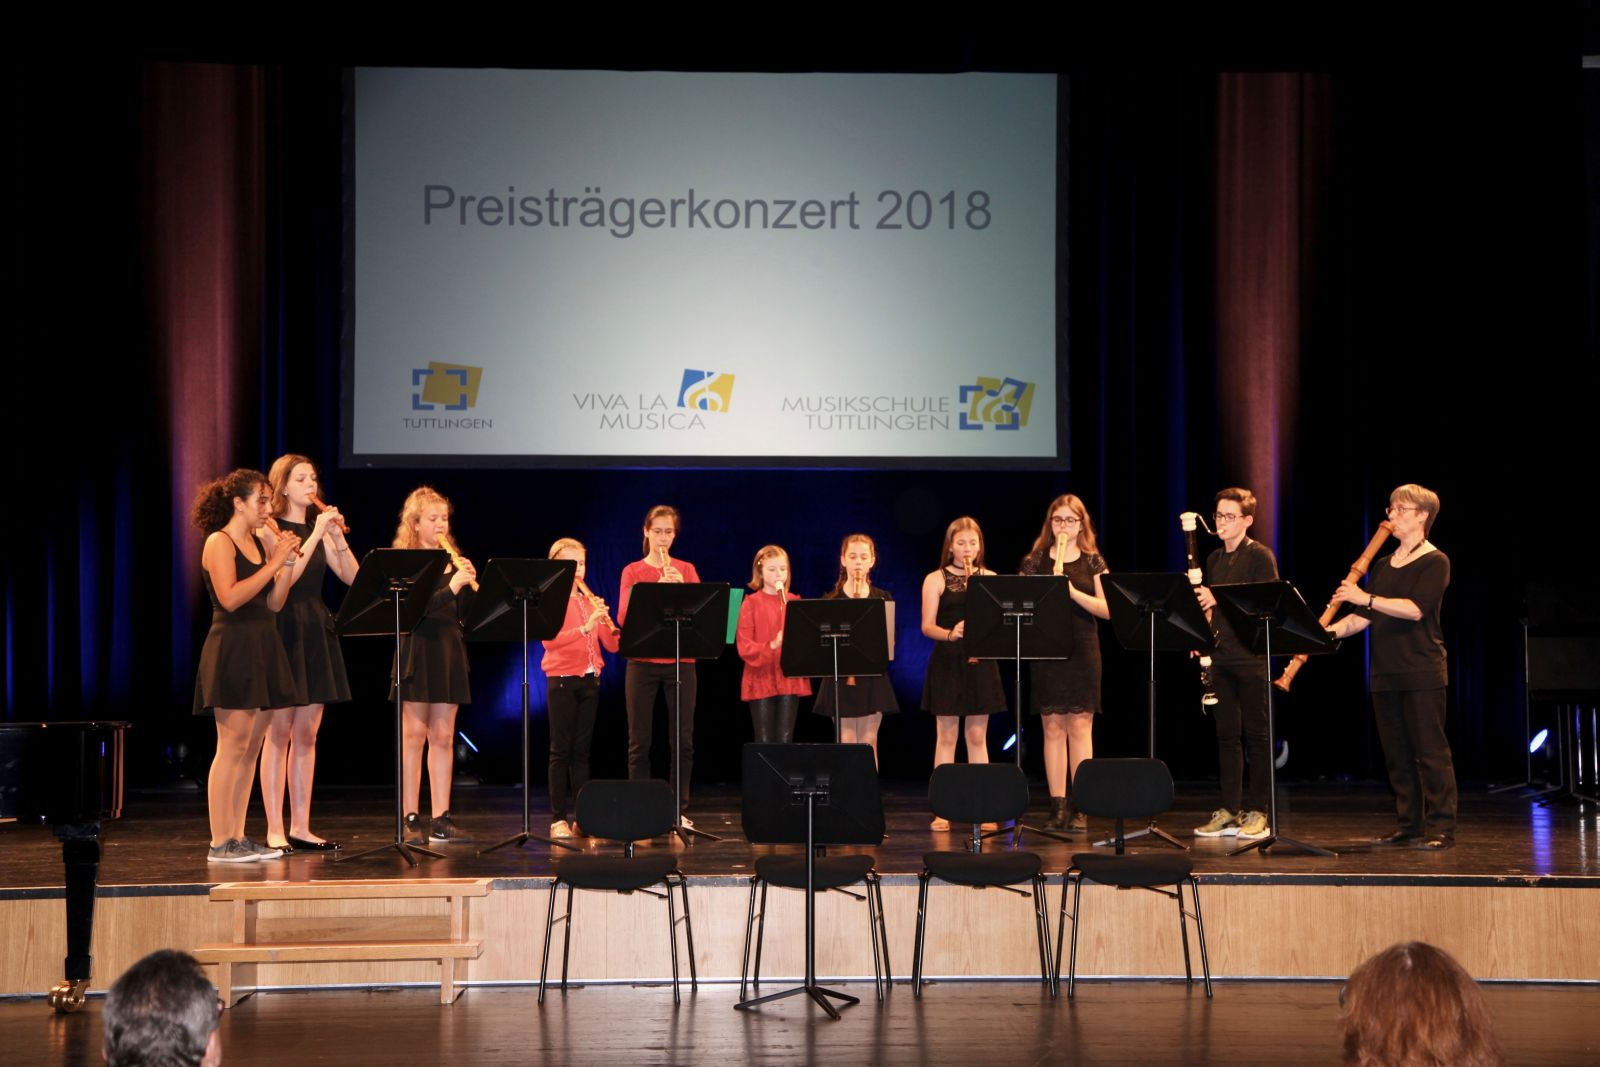 Preistraegerkonzert2018_05